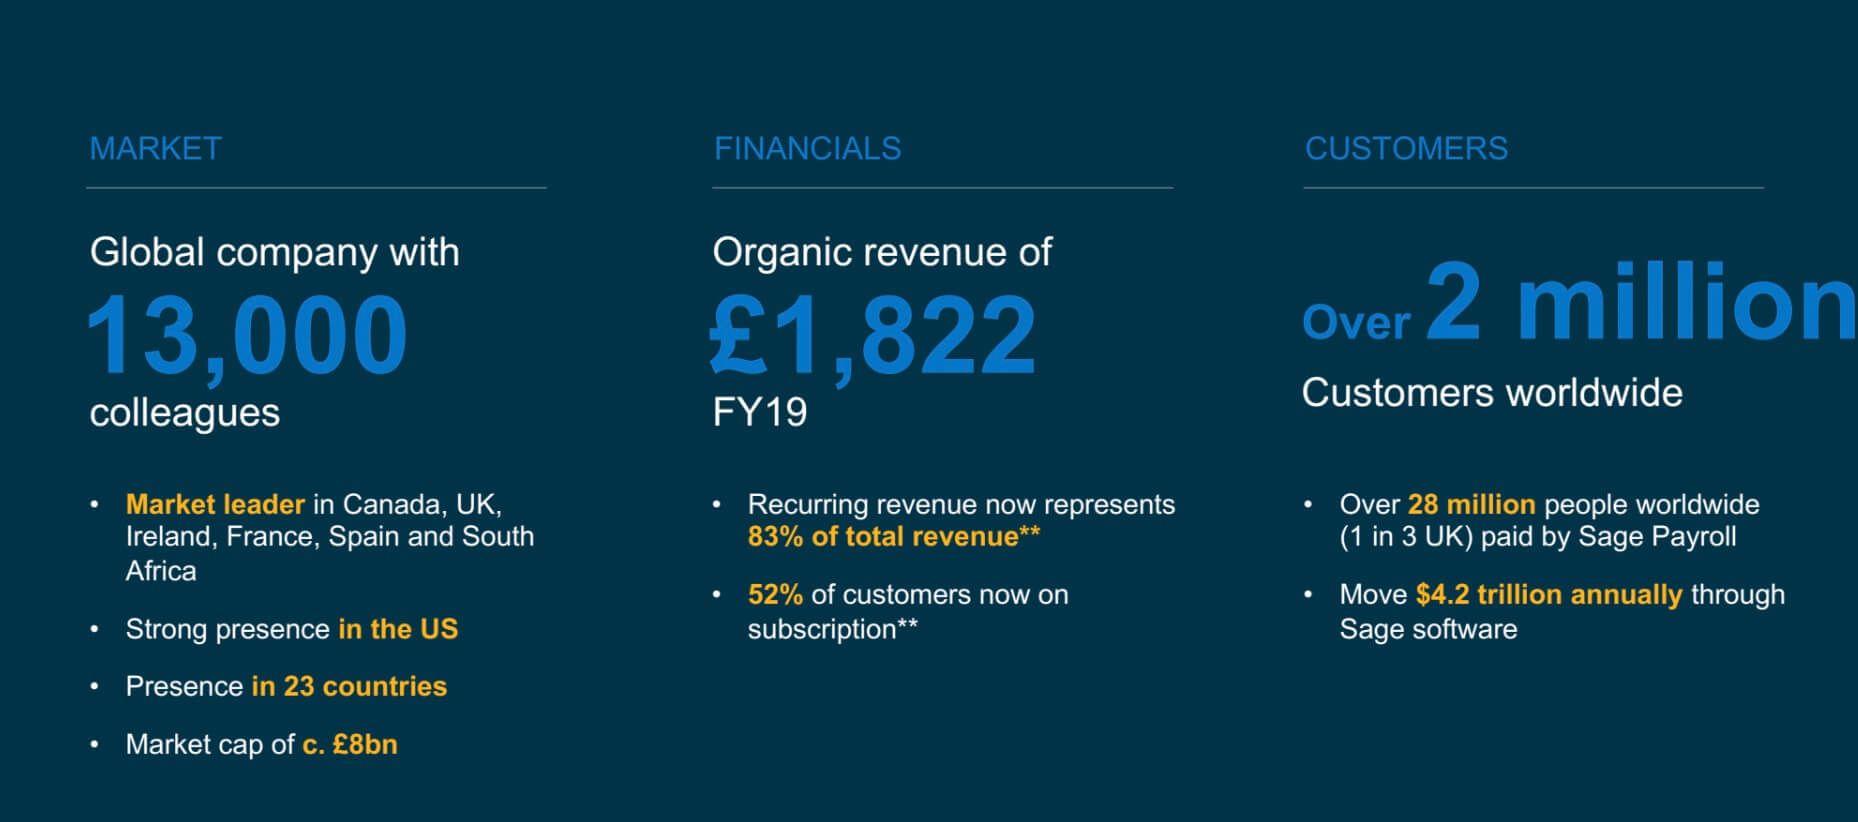 Sage: Global company with over 2 million customers worldwide